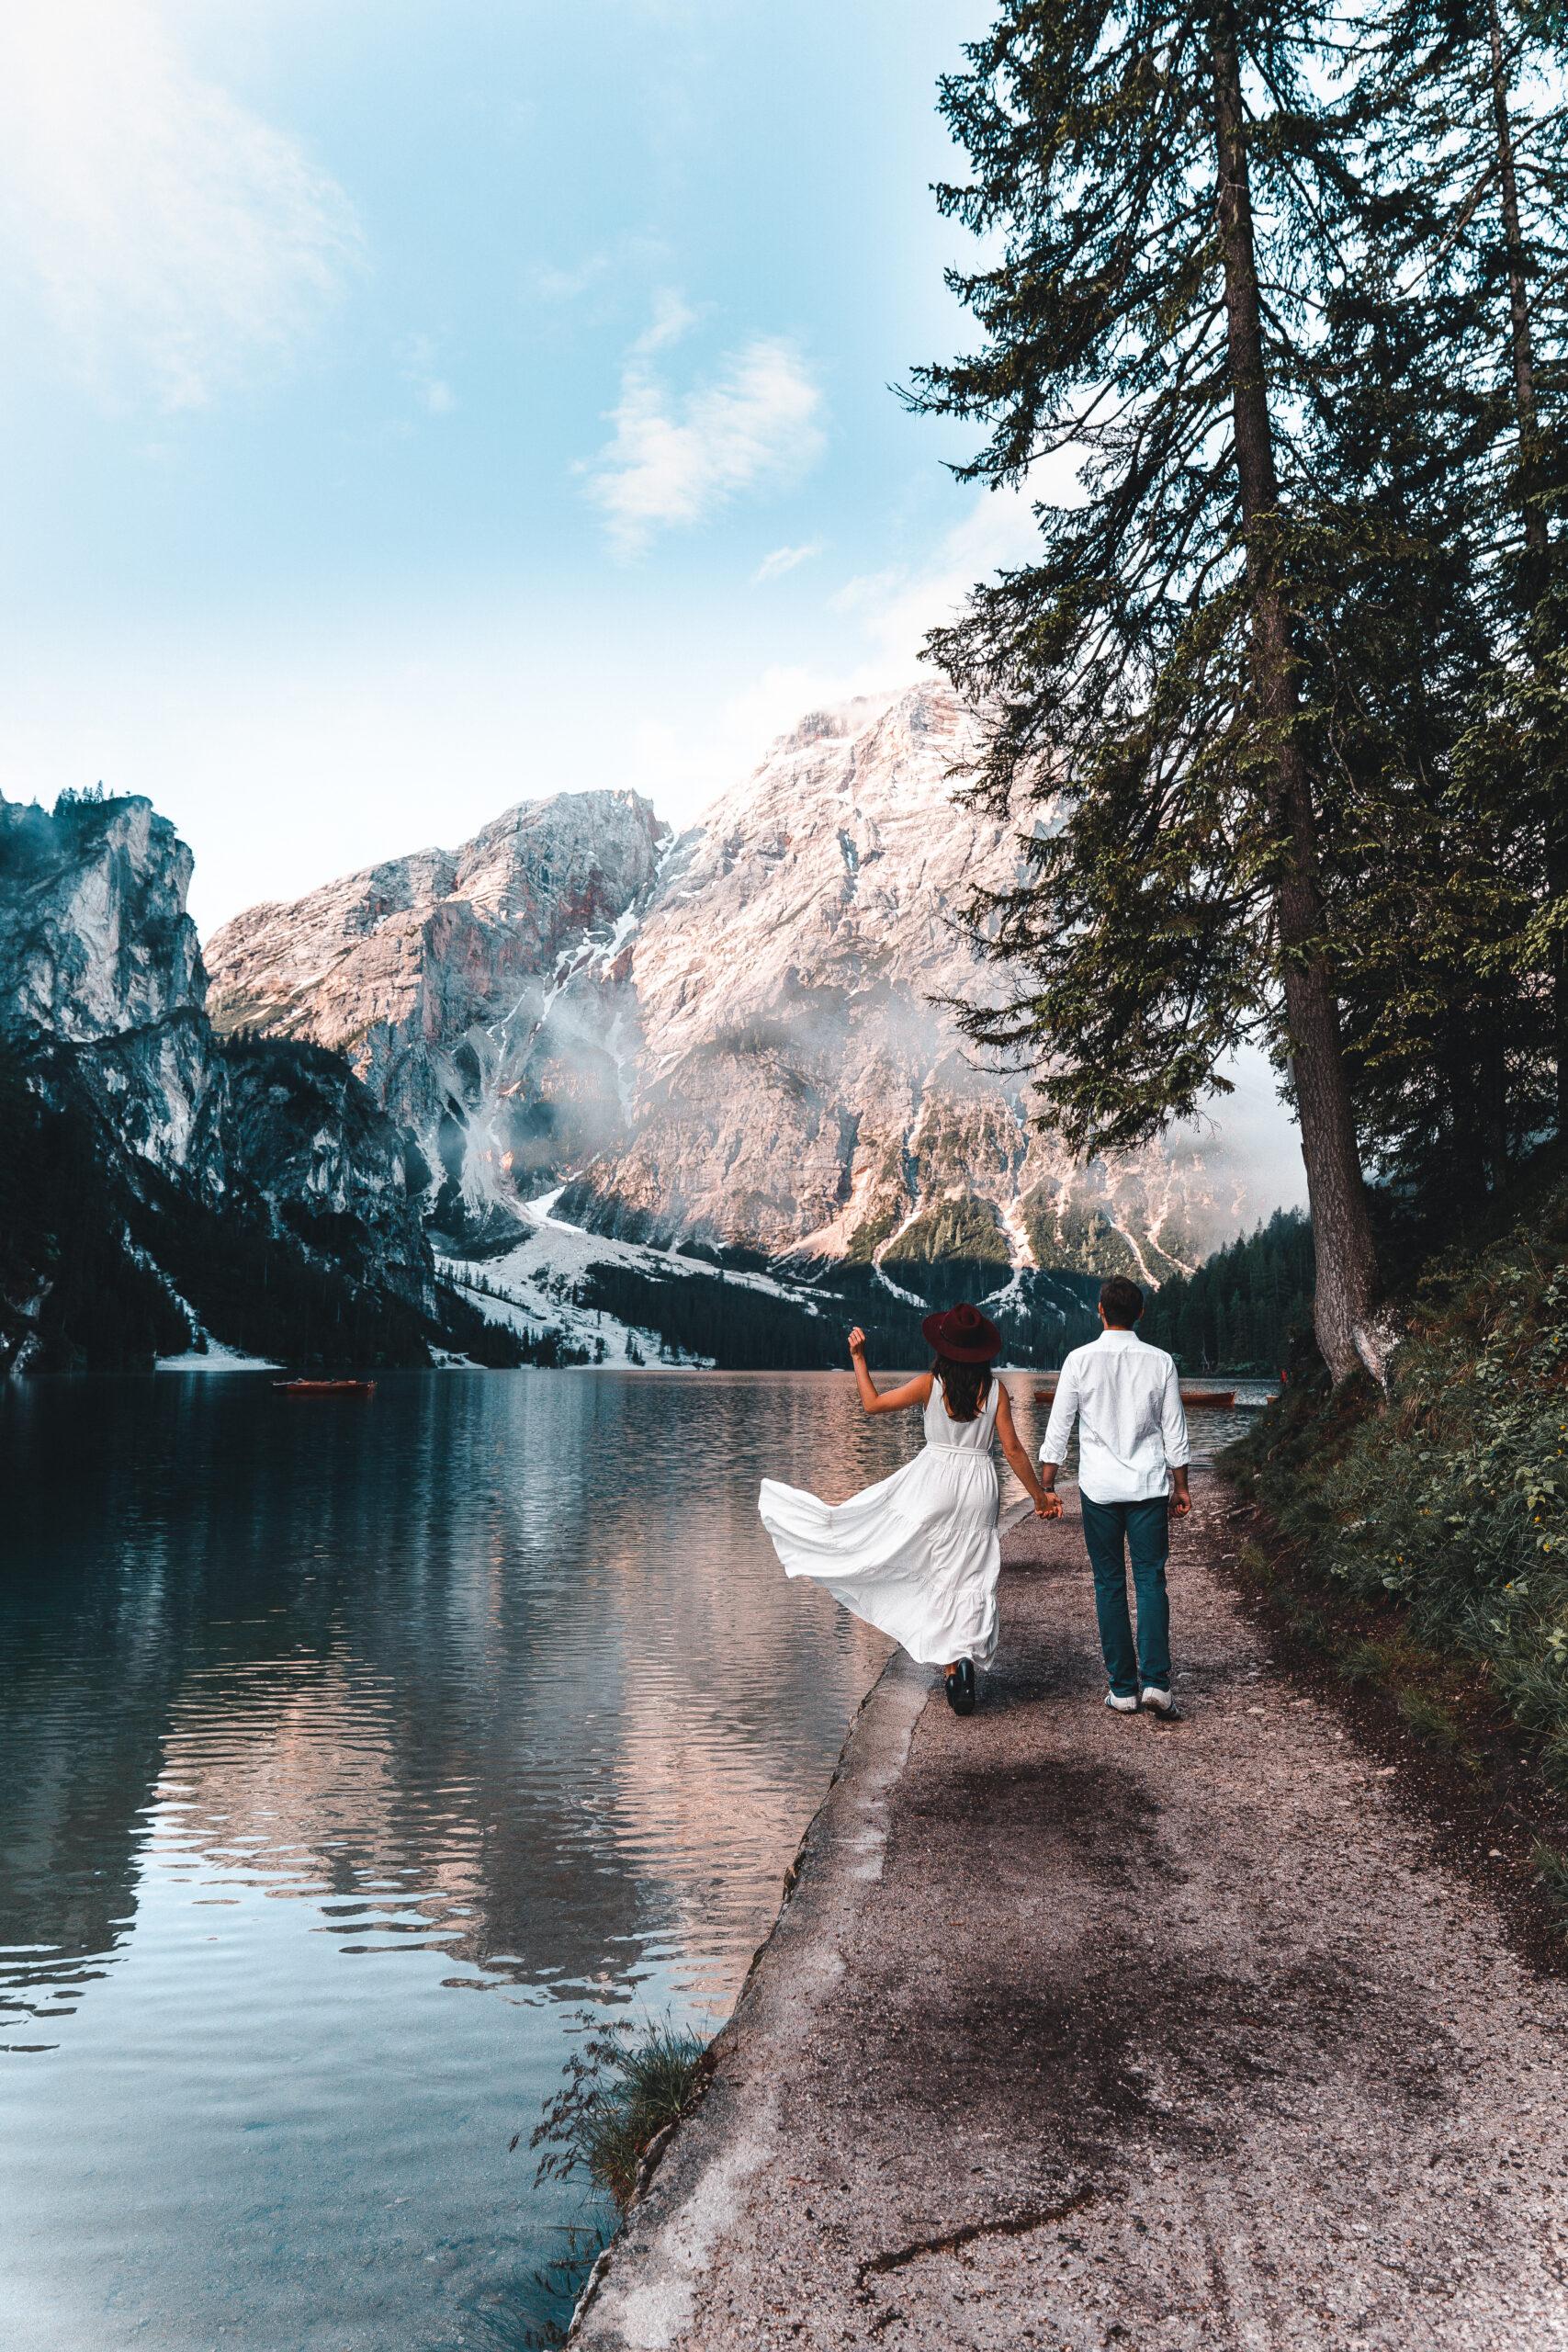 Lago di Braies |Complete travel guide for Lago di Braies